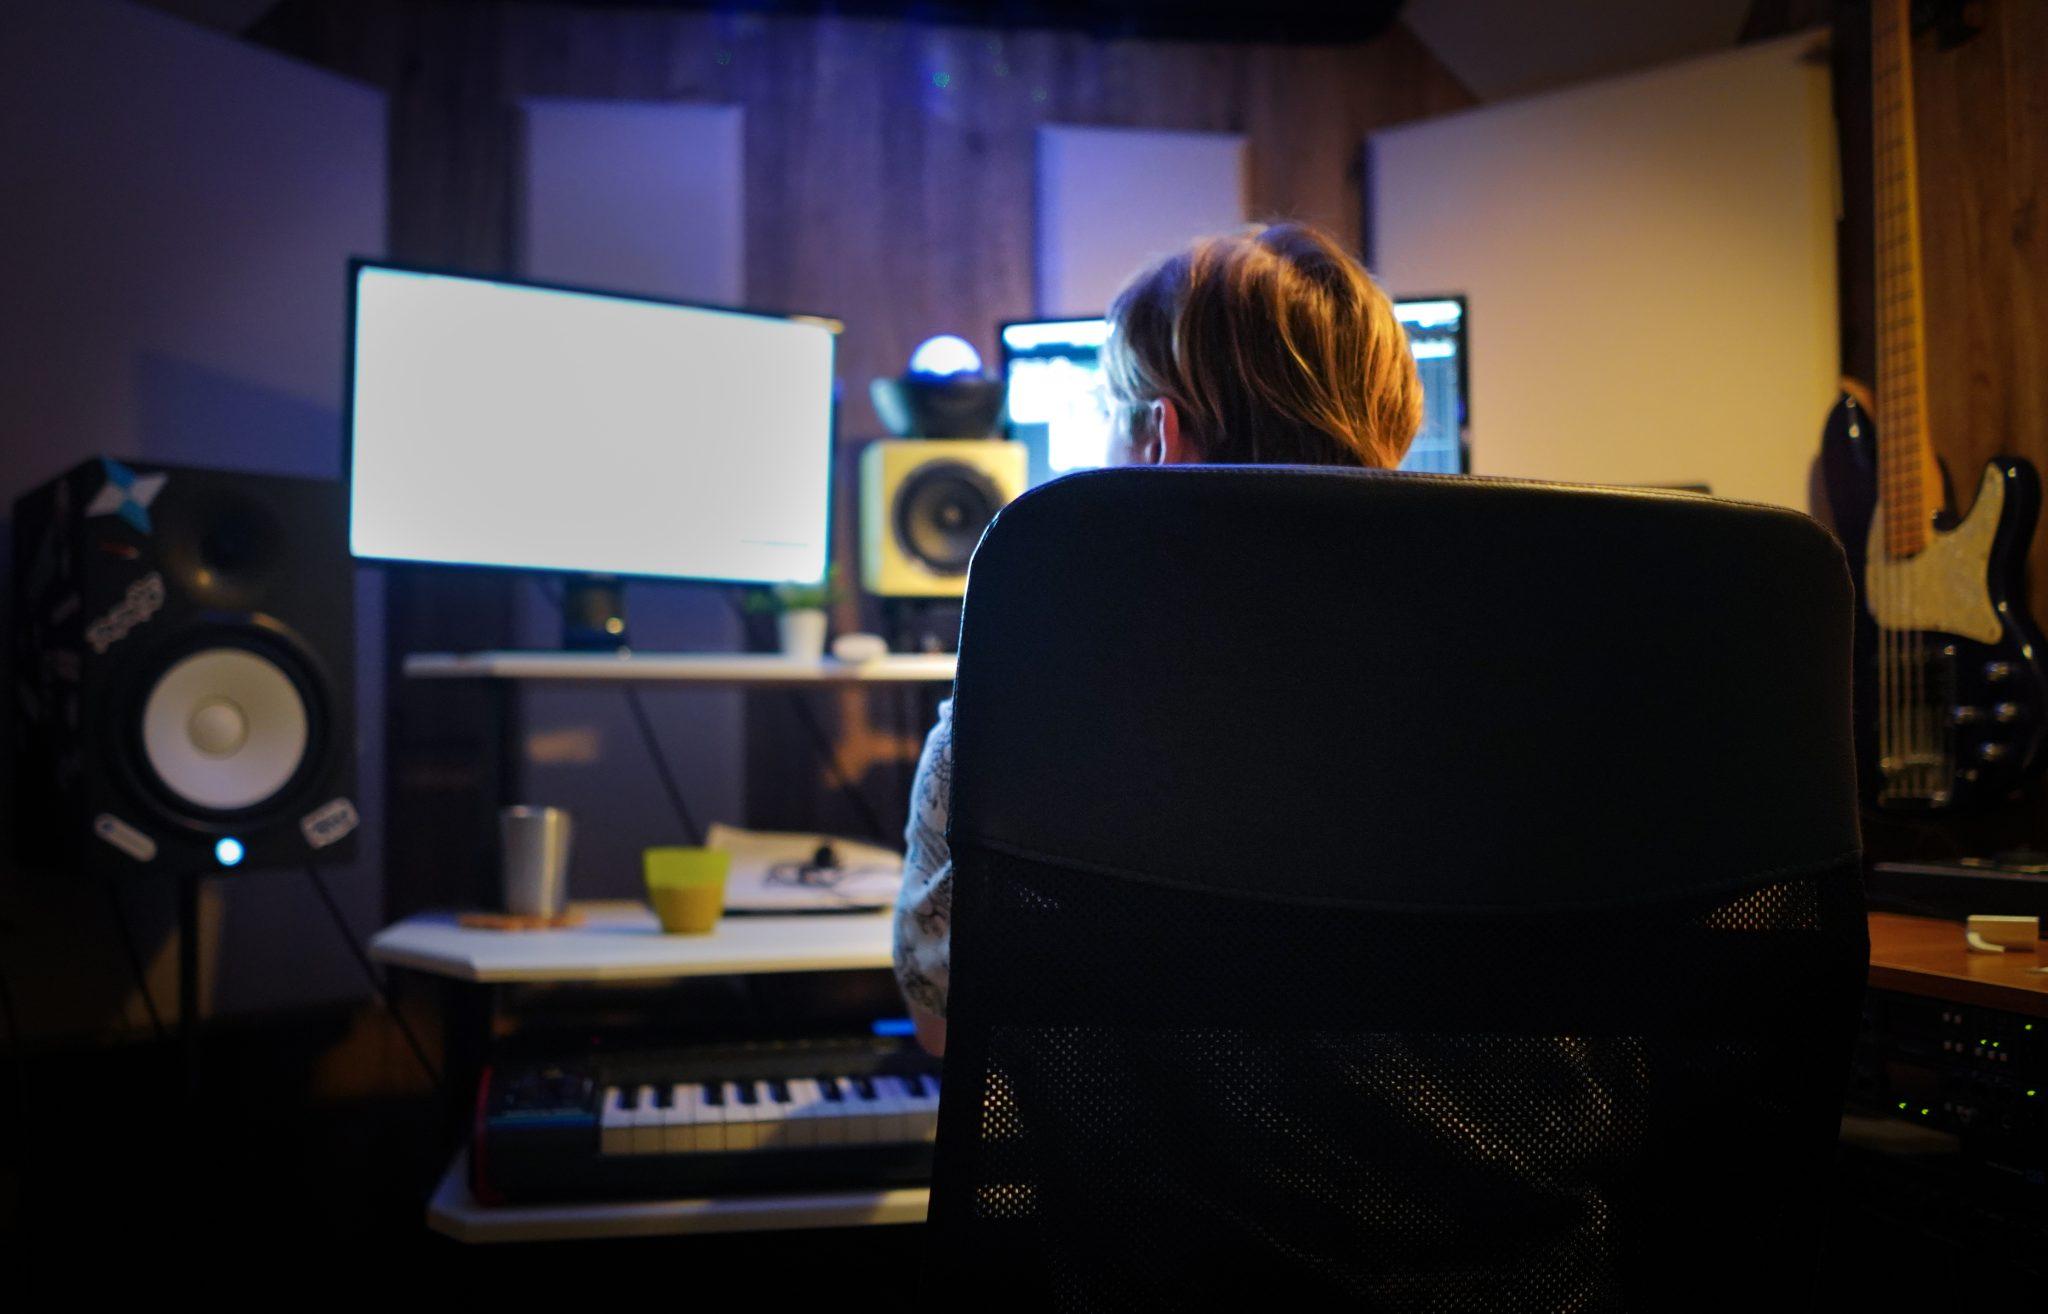 New Studio Photshoot - Edited-03570